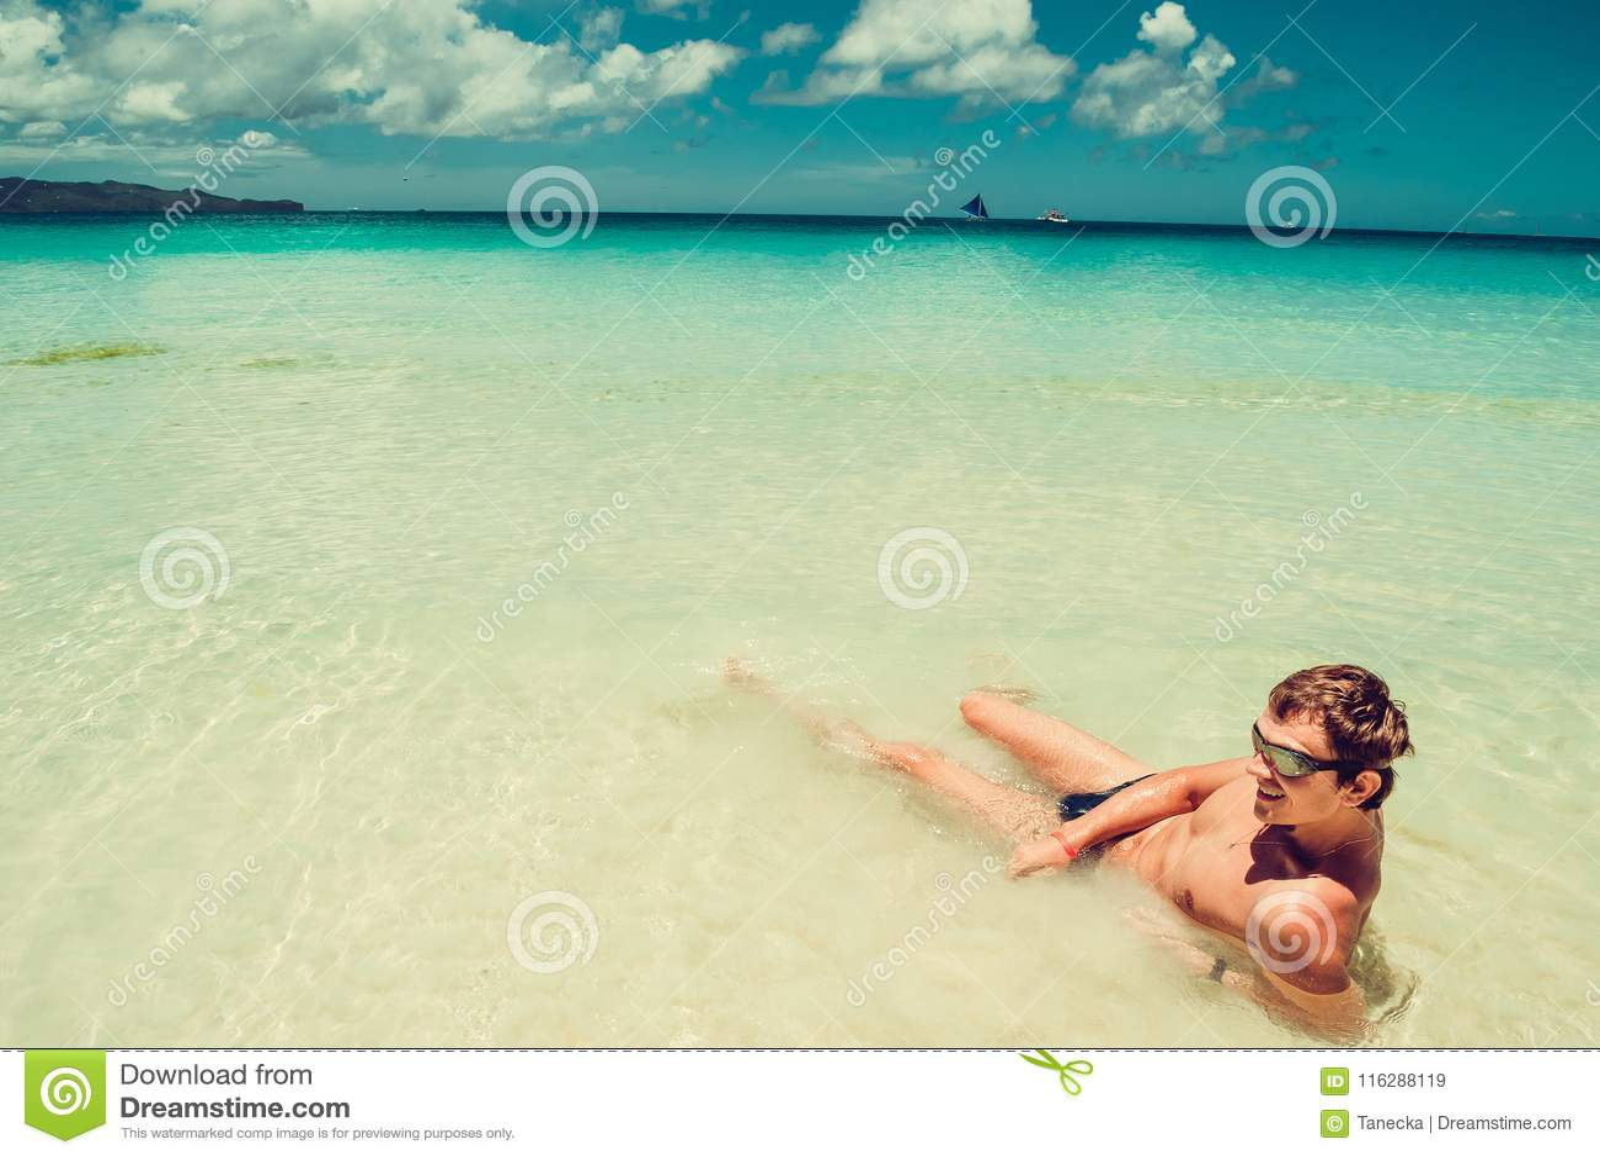 happy man in swimming goggles relax in sea enjoying summer beach